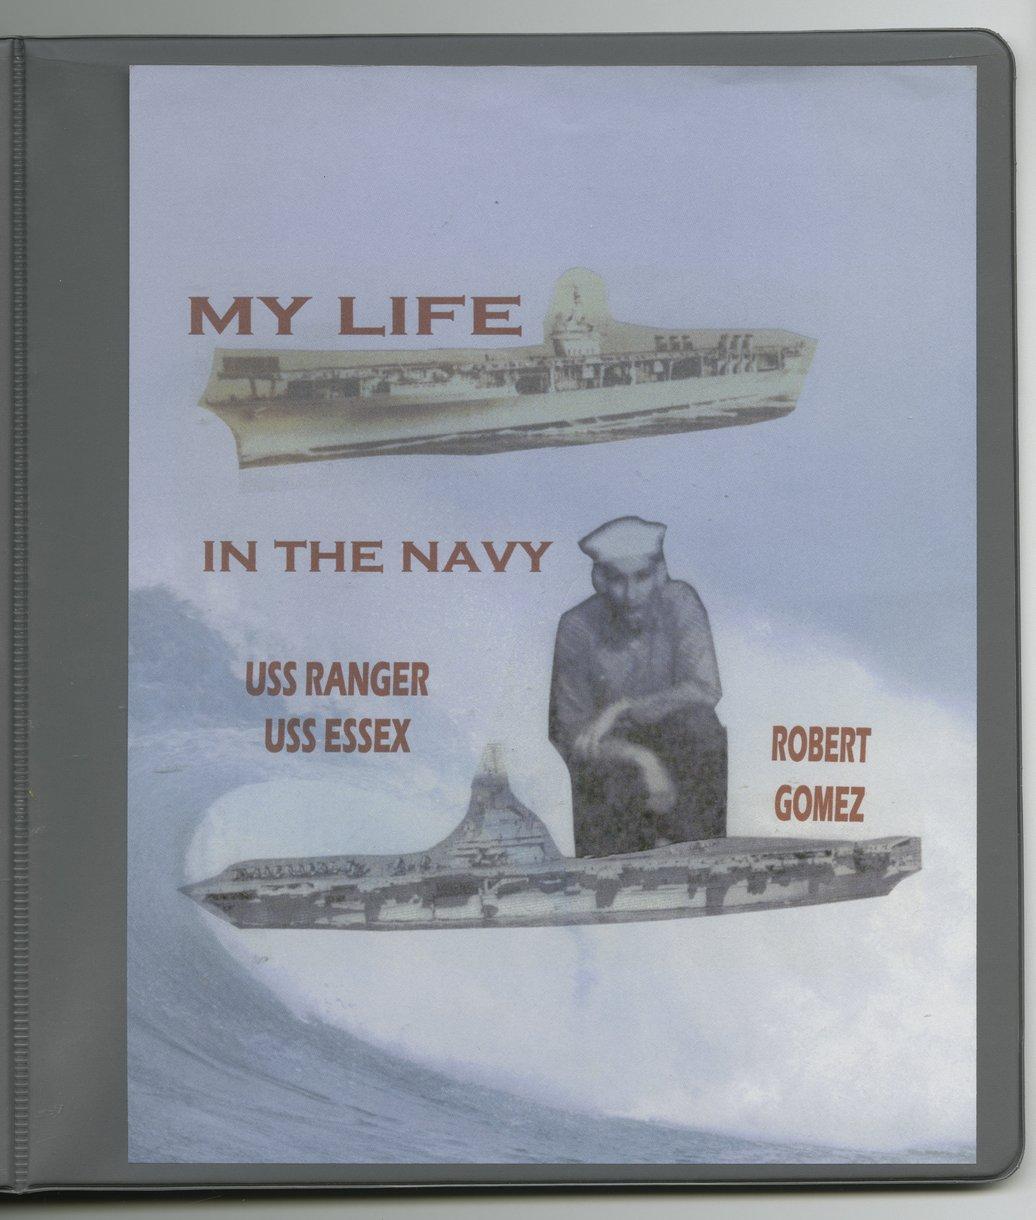 Robert Gomez military scrapbook - Front cover